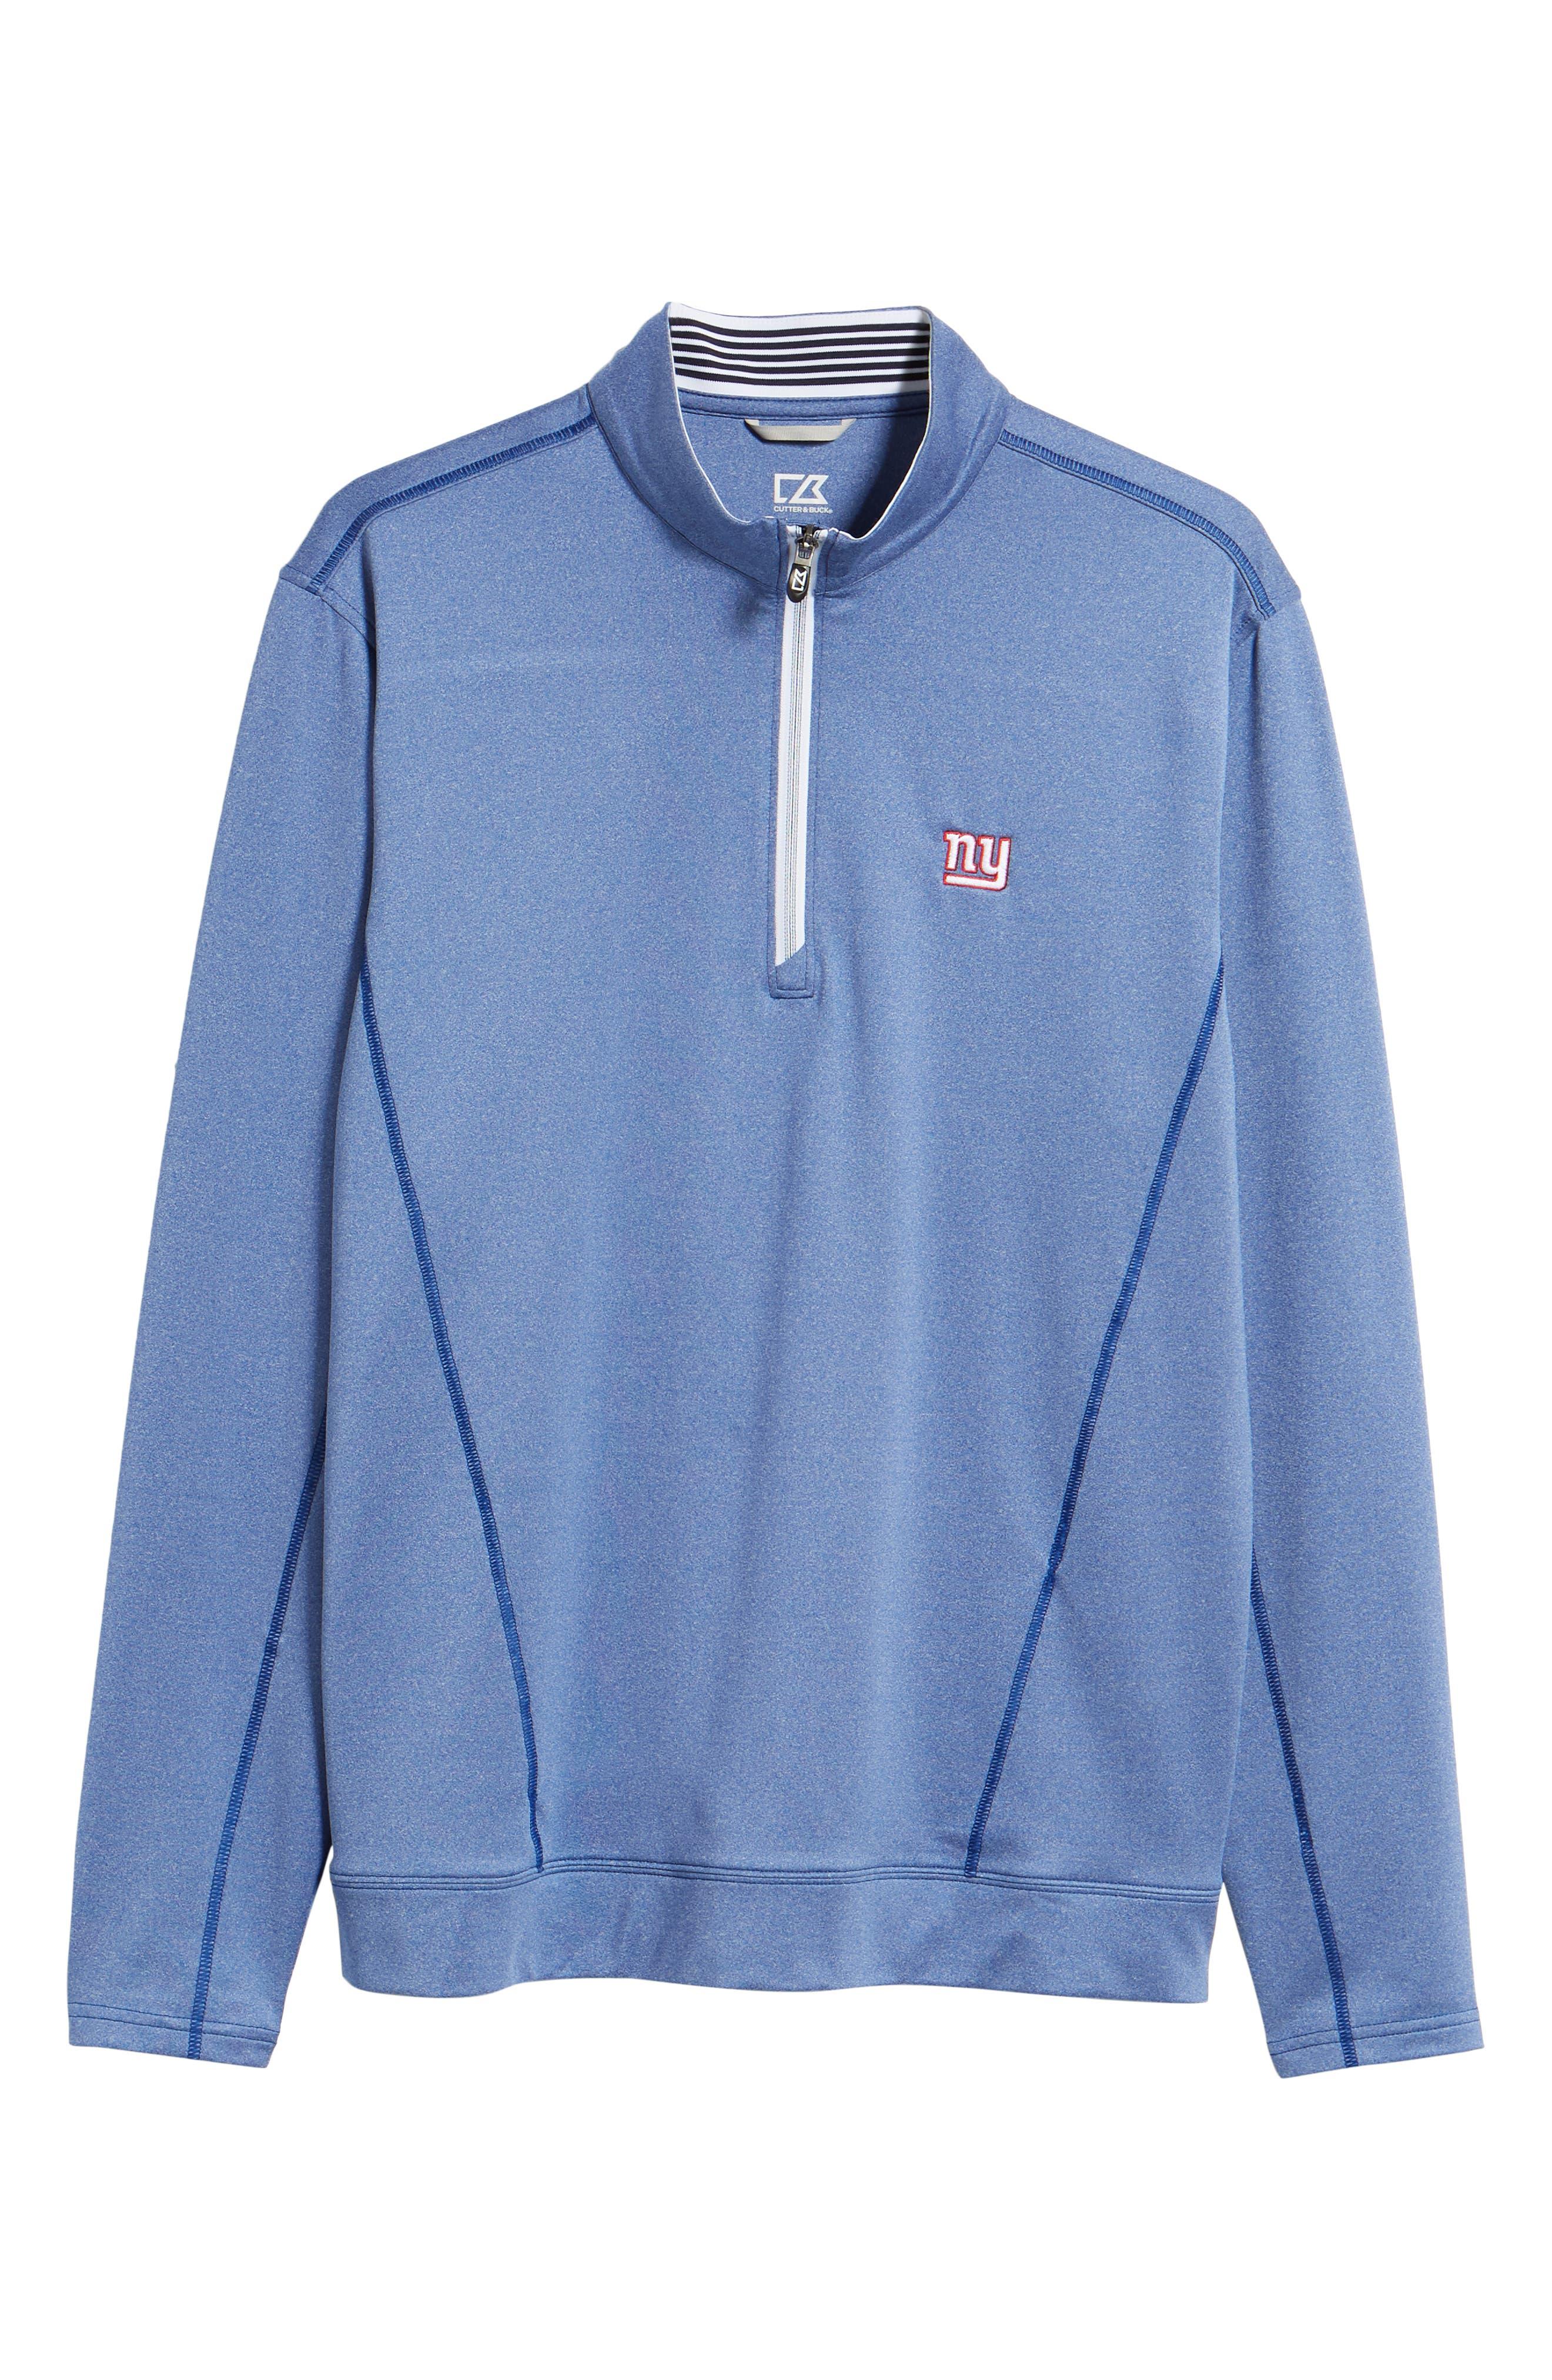 Endurance New York Giants Regular Fit Pullover,                             Alternate thumbnail 6, color,                             TOUR BLUE HEATHER